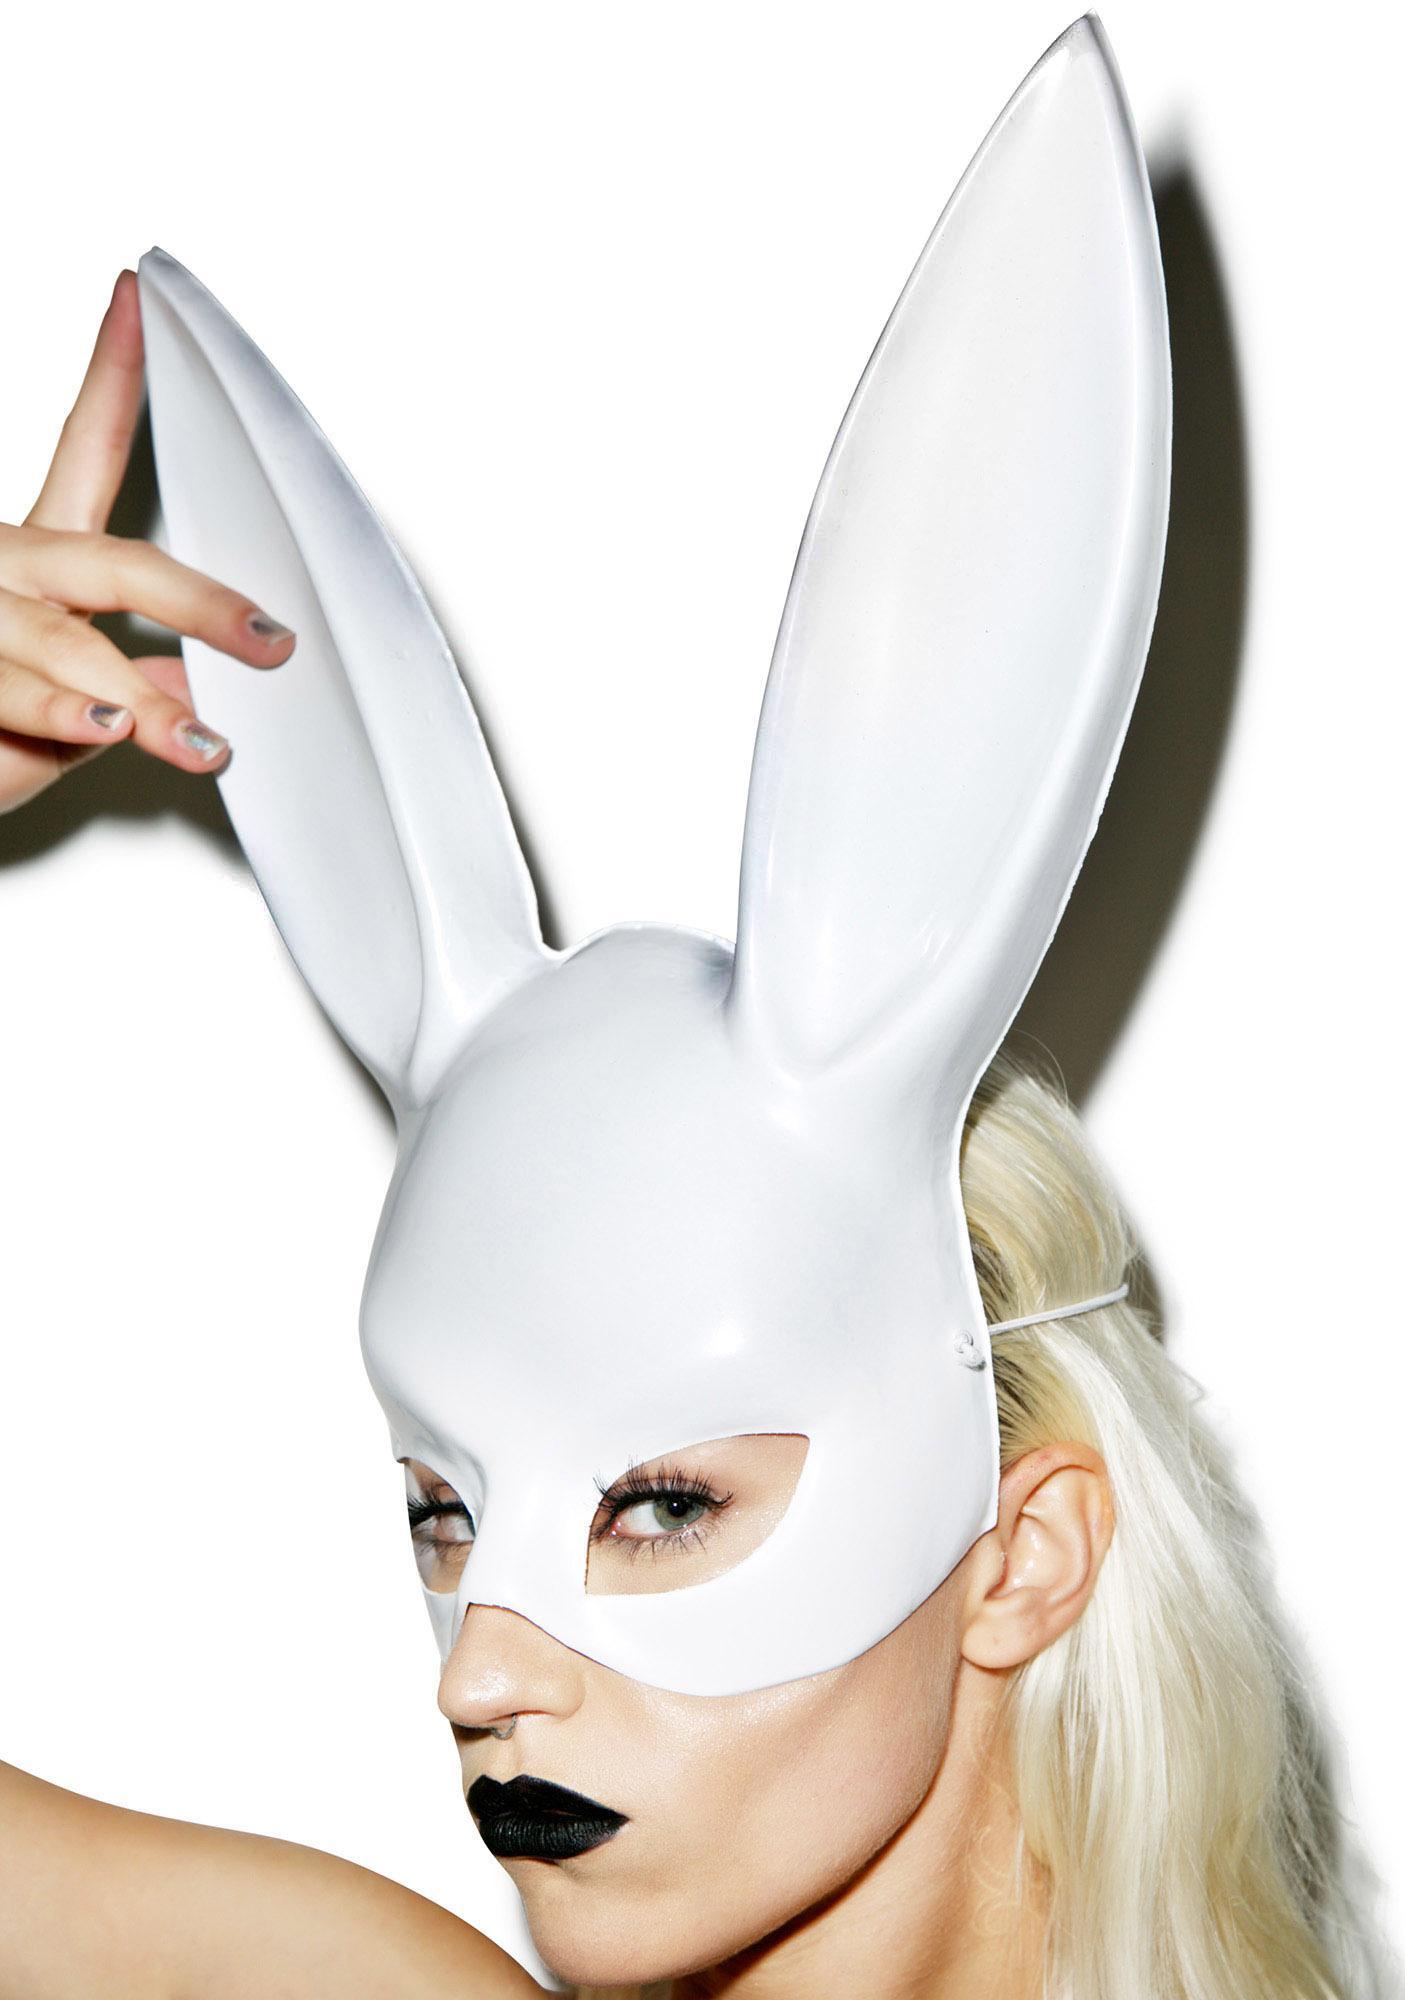 Luxury White Rabbit Mask - Bespoke Masks, Headdresses ... |Rabbit Face Mask